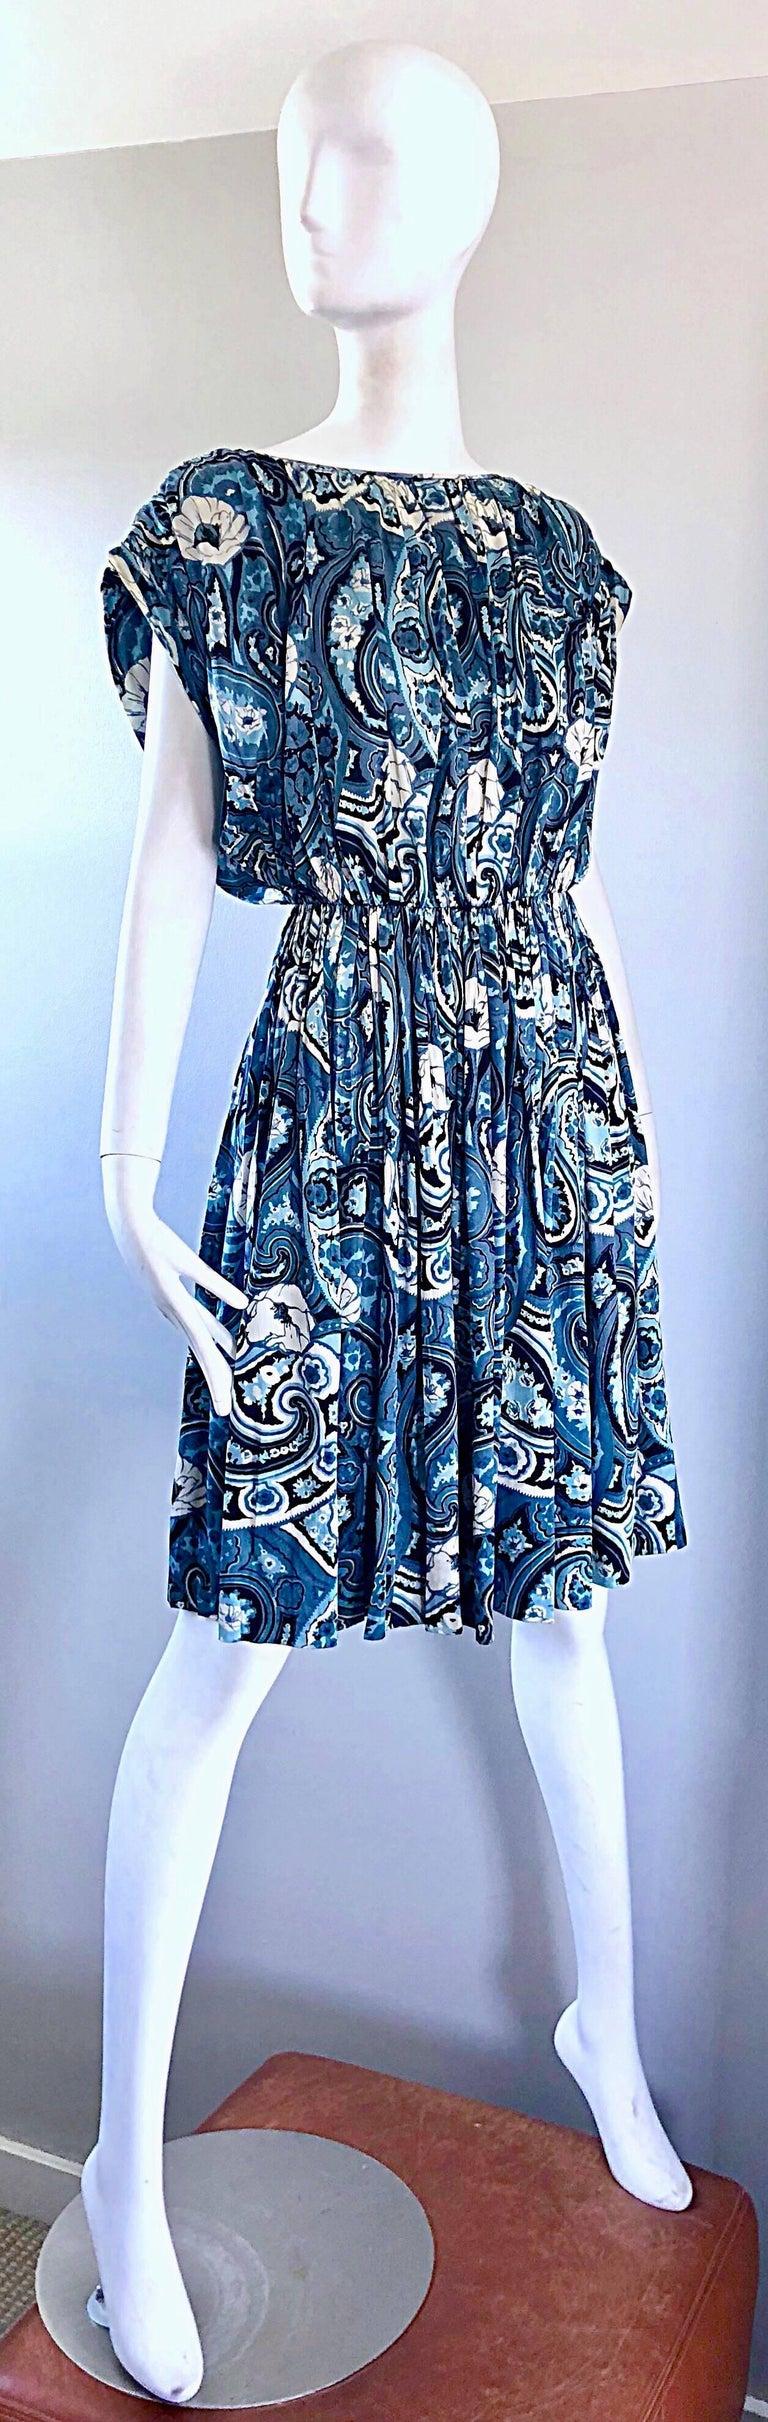 Rare 1950s Townley Blue + White Paisley Flower Print Vintage 50s Dress For Sale 11